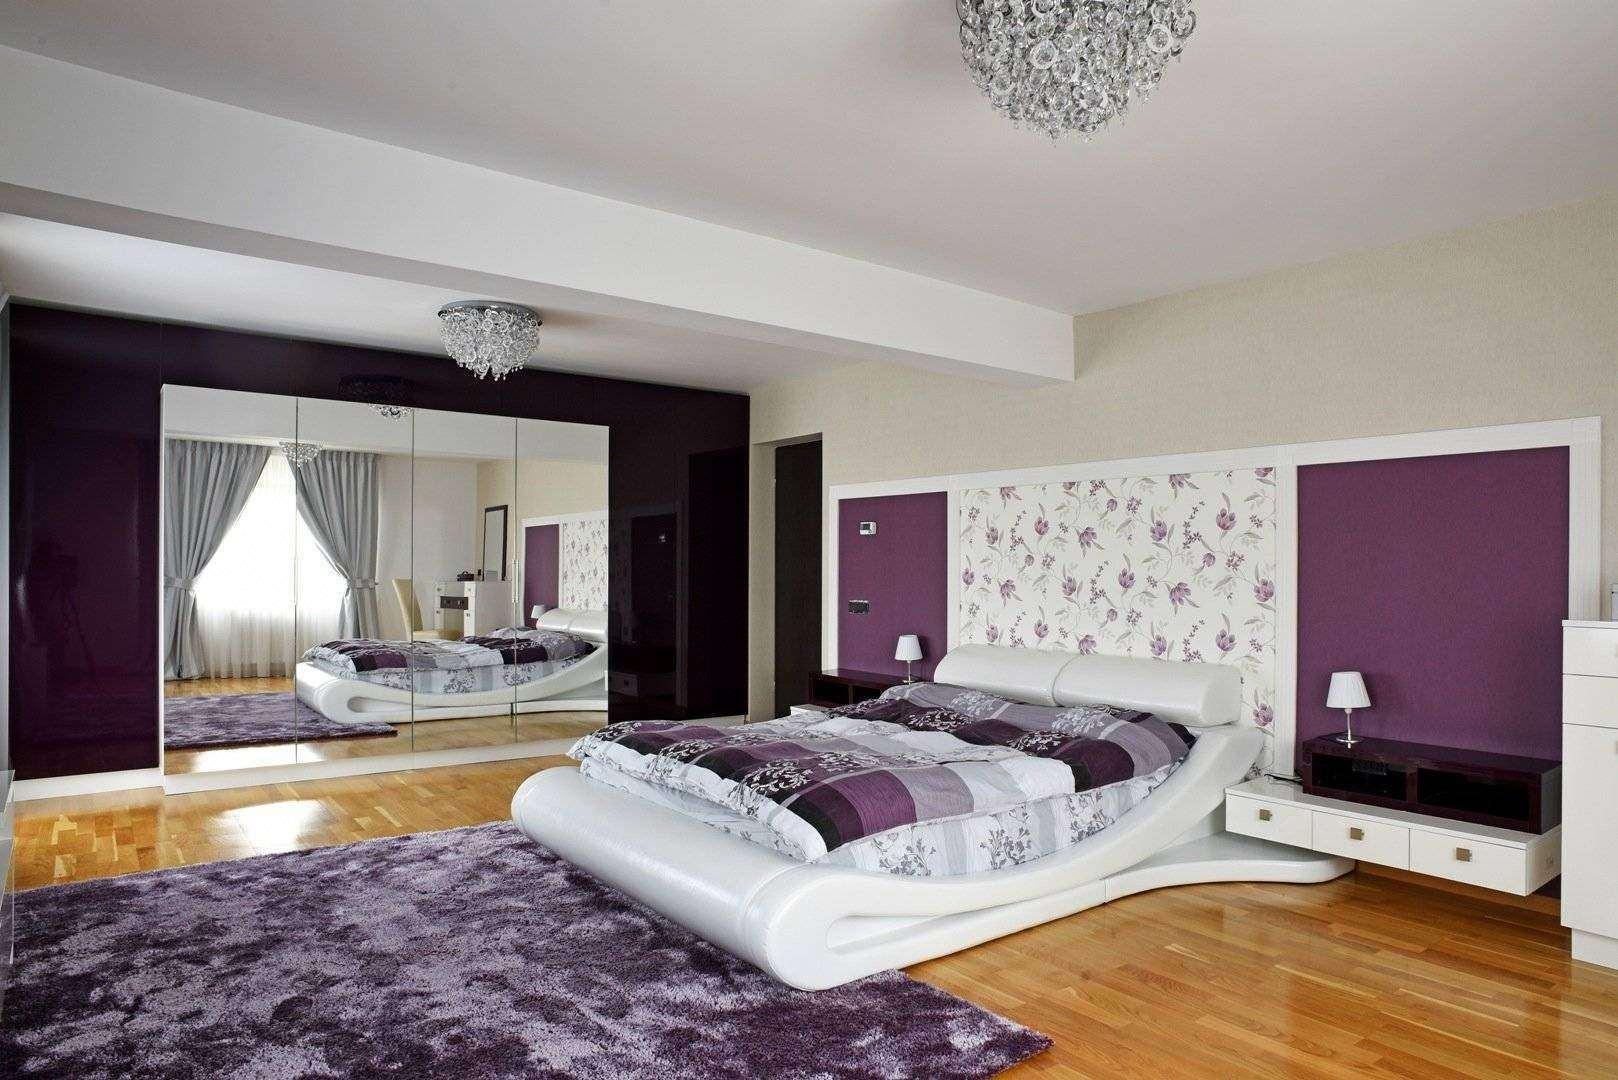 <a href=&quot;mobila dormitor la comanda moderna &quot;>Ansamblu dormitor matrimonial <img src='https://www.unican.ro/wp-content/themes/vita/img/dreapta.png' class='pull-right hidden-xs' style='margin-right:-10px;margin-top:-10px; max-height:41px'></a>